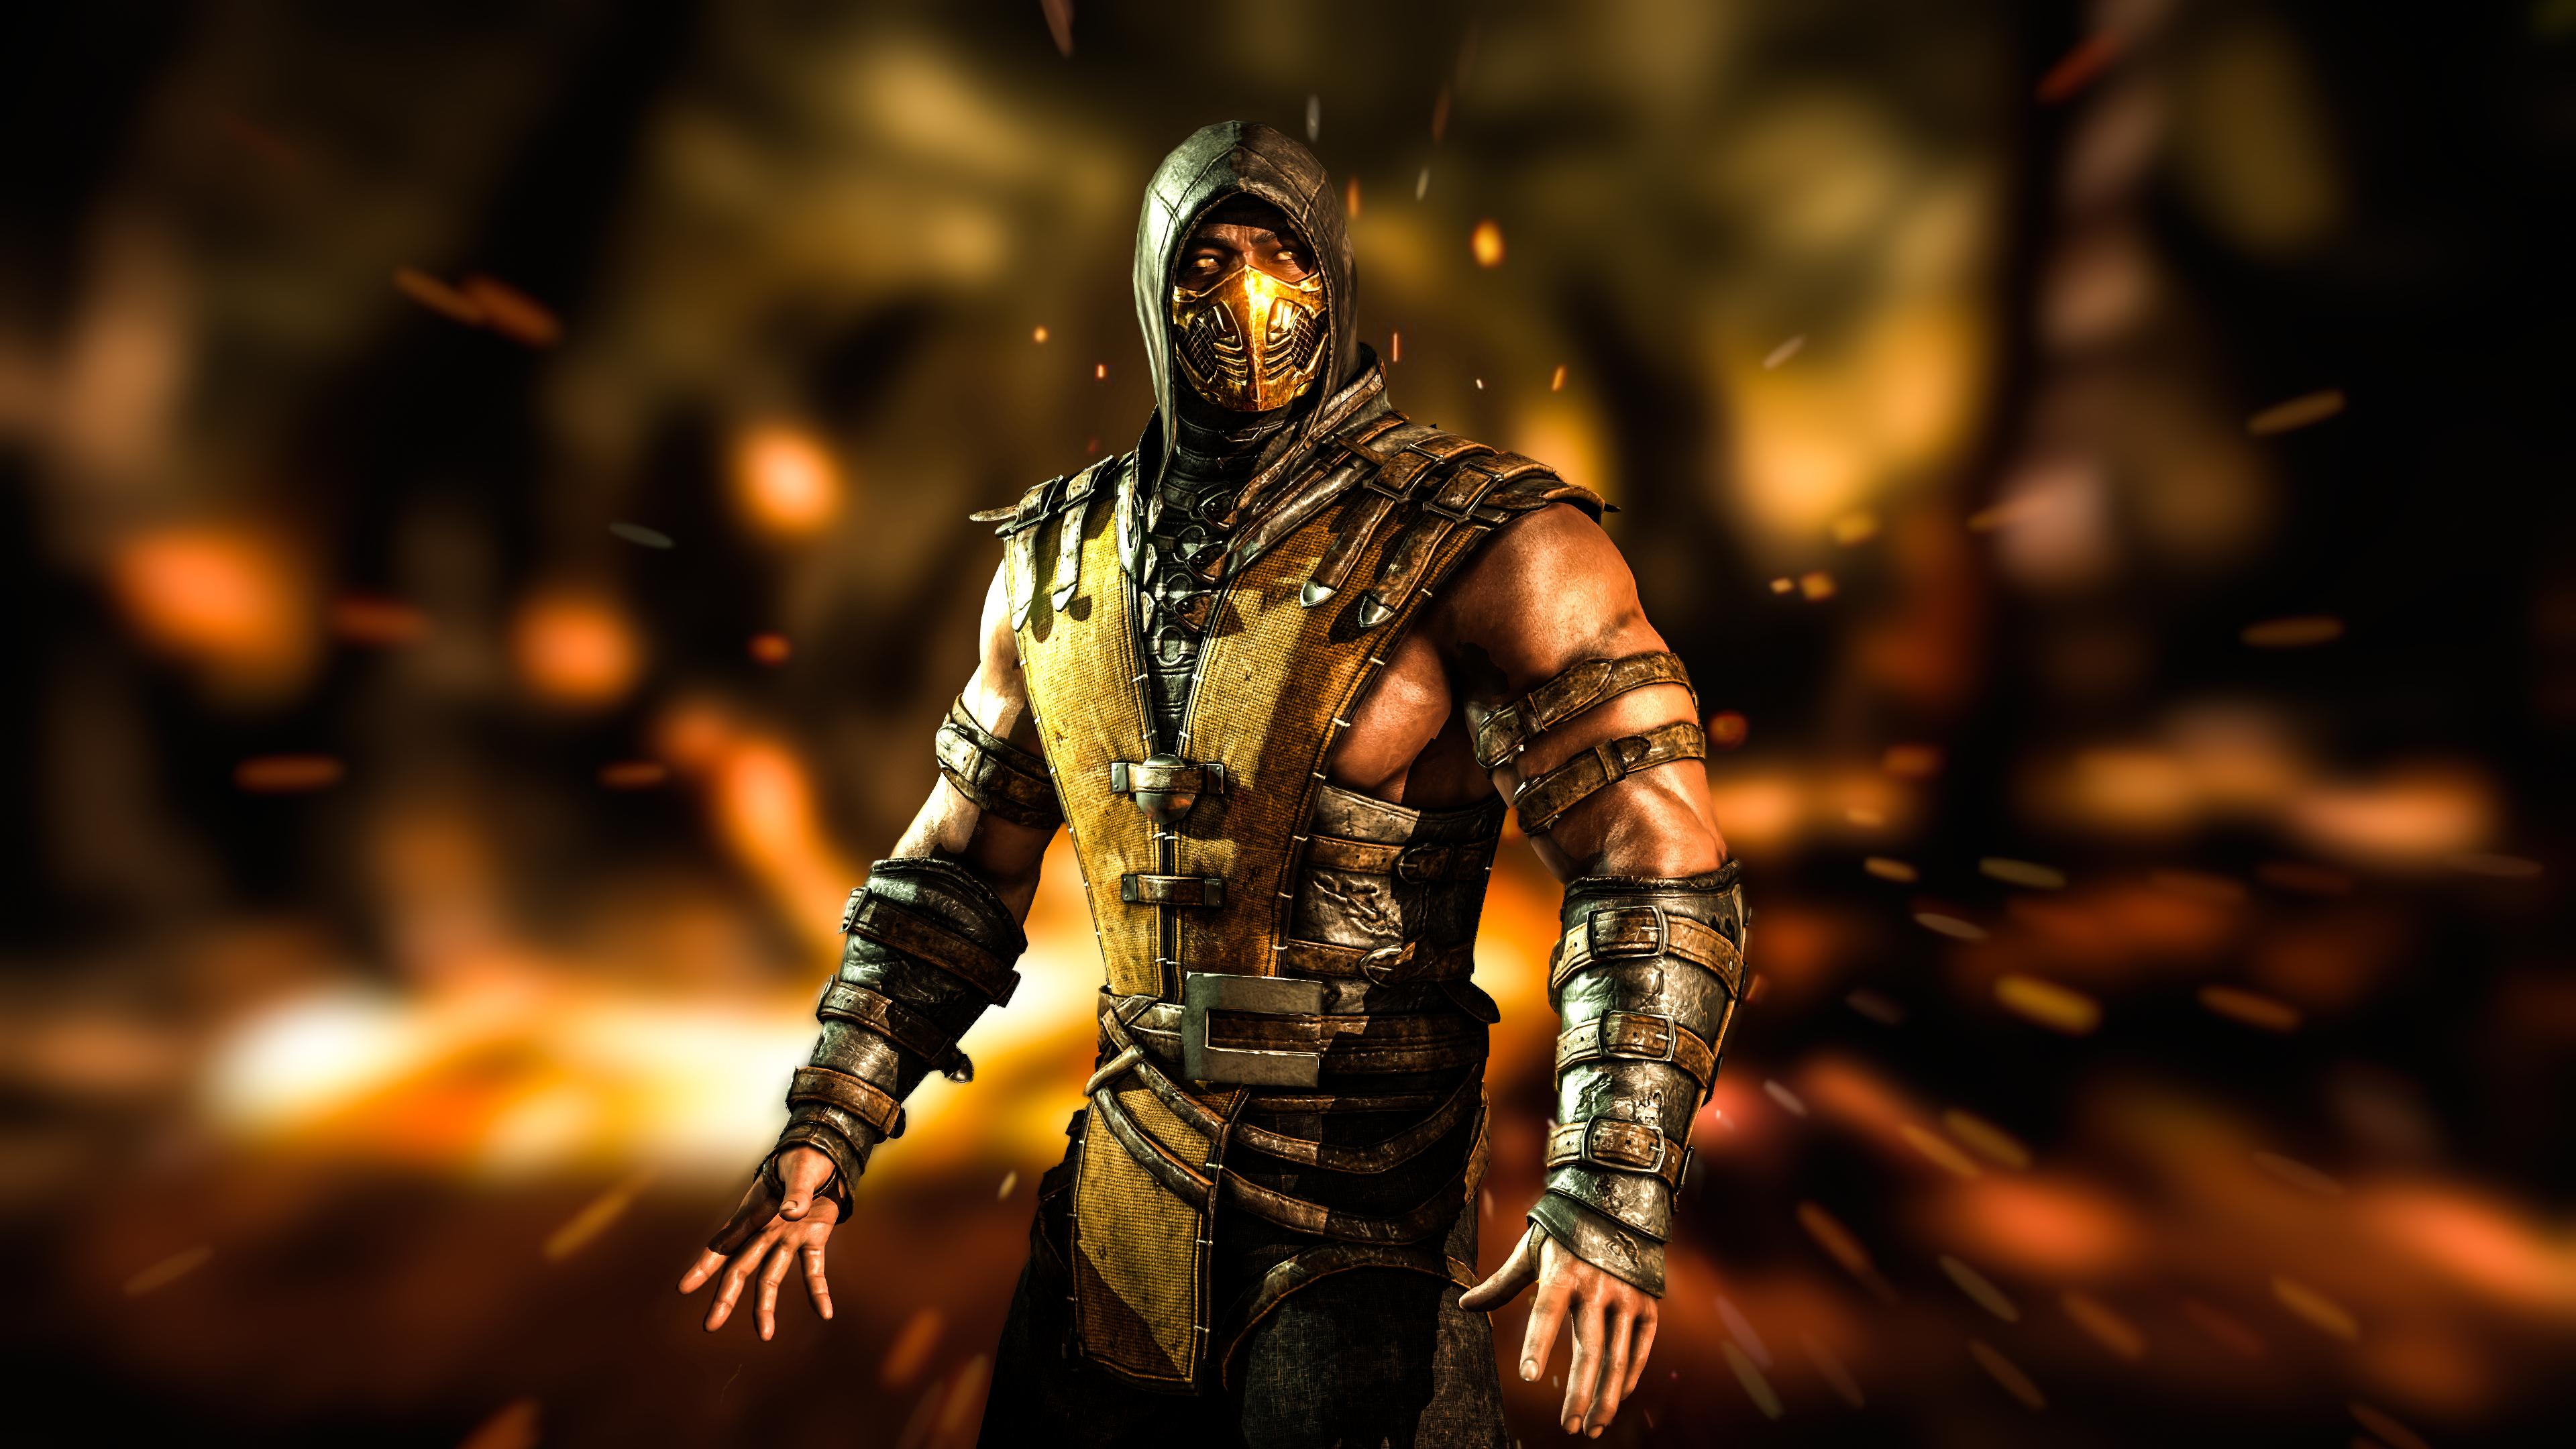 Pics Photos   Mortal Kombat Scorpion Desktop Wallpaper 3840x2160